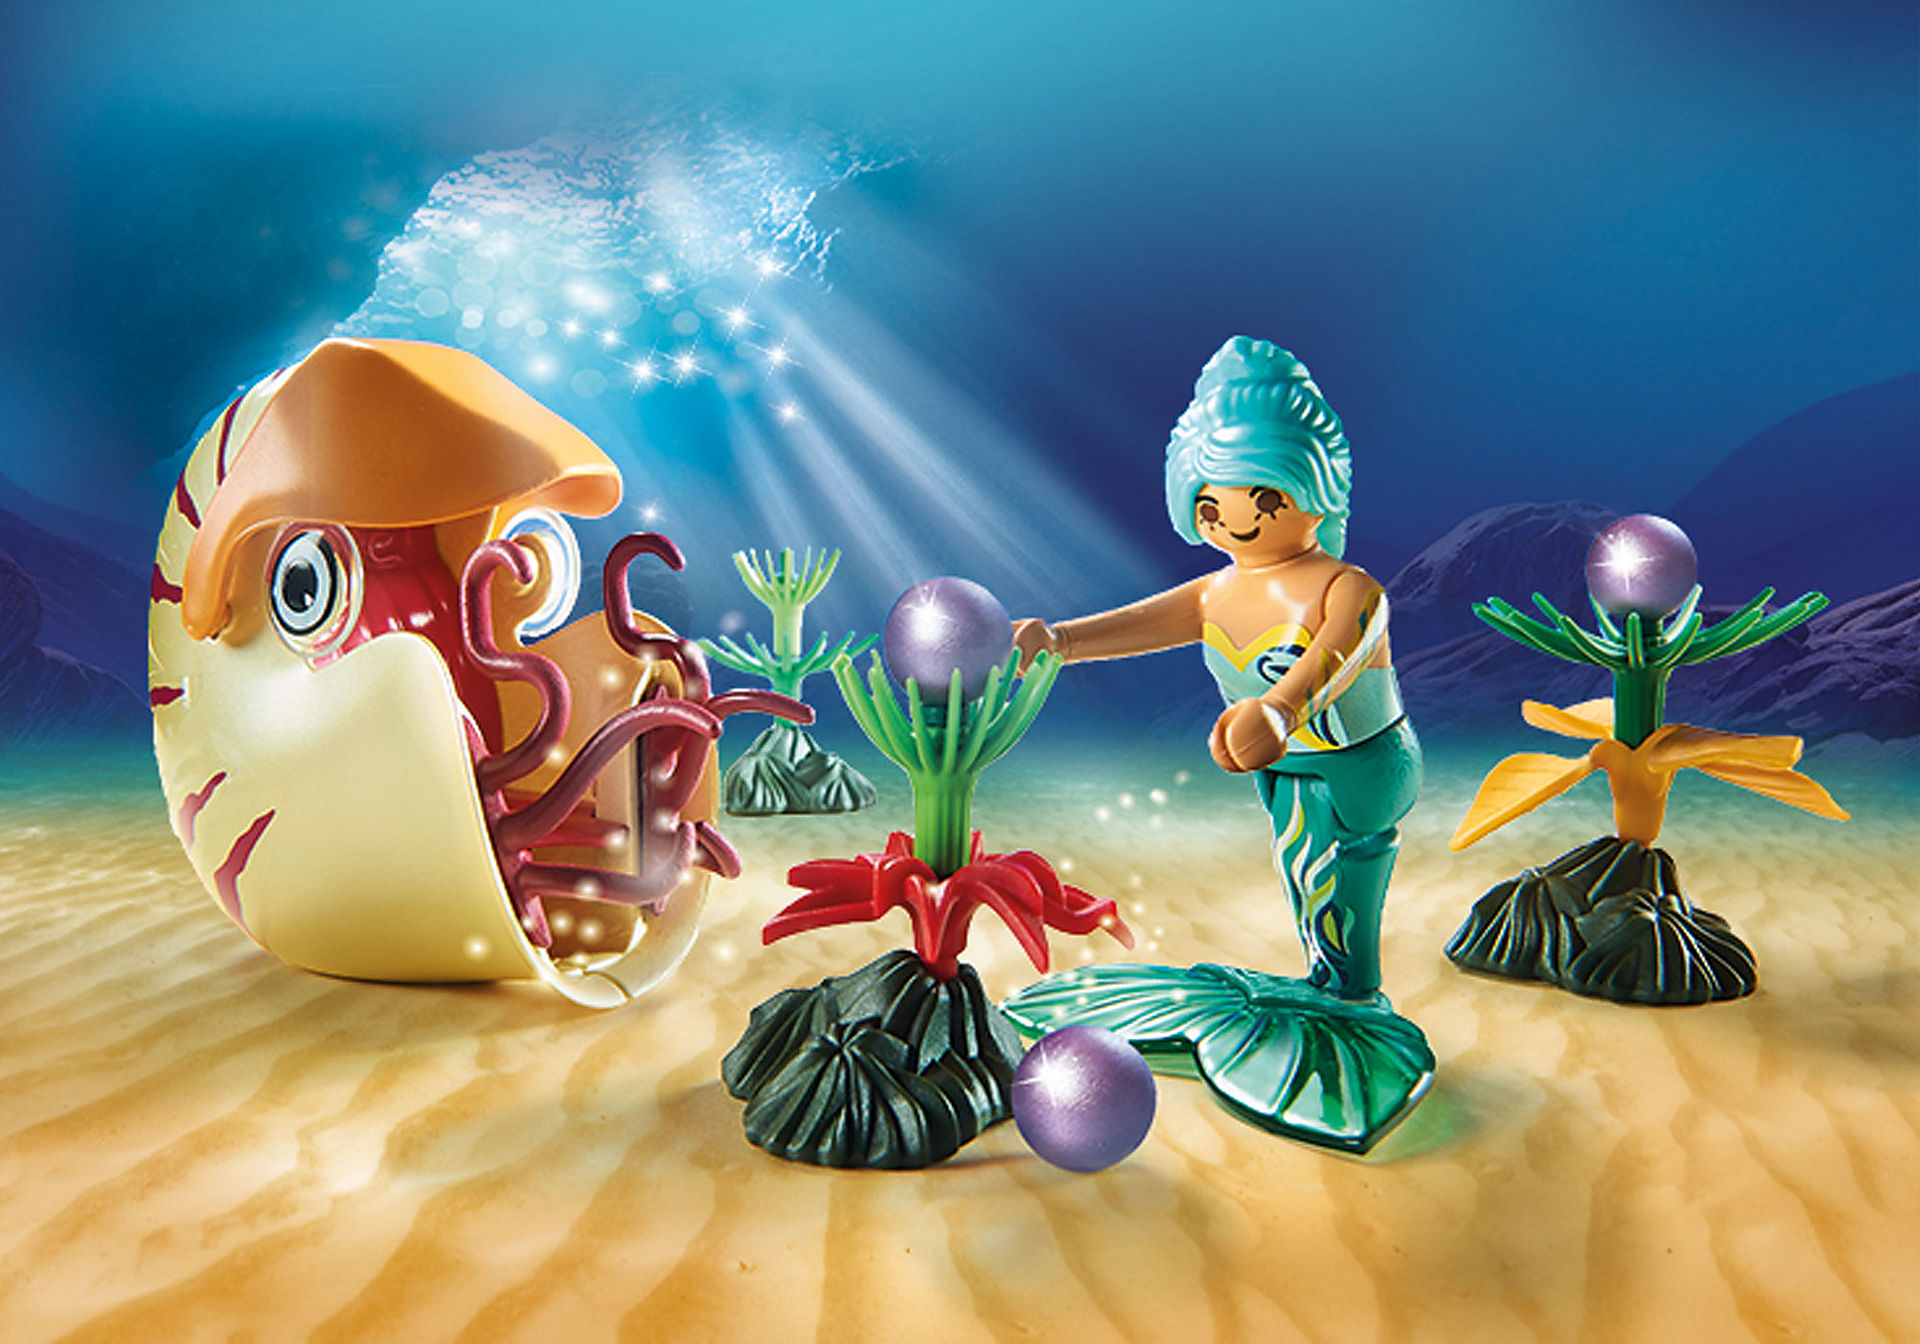 70098 Sirena con carrozza nautilus zoom image4